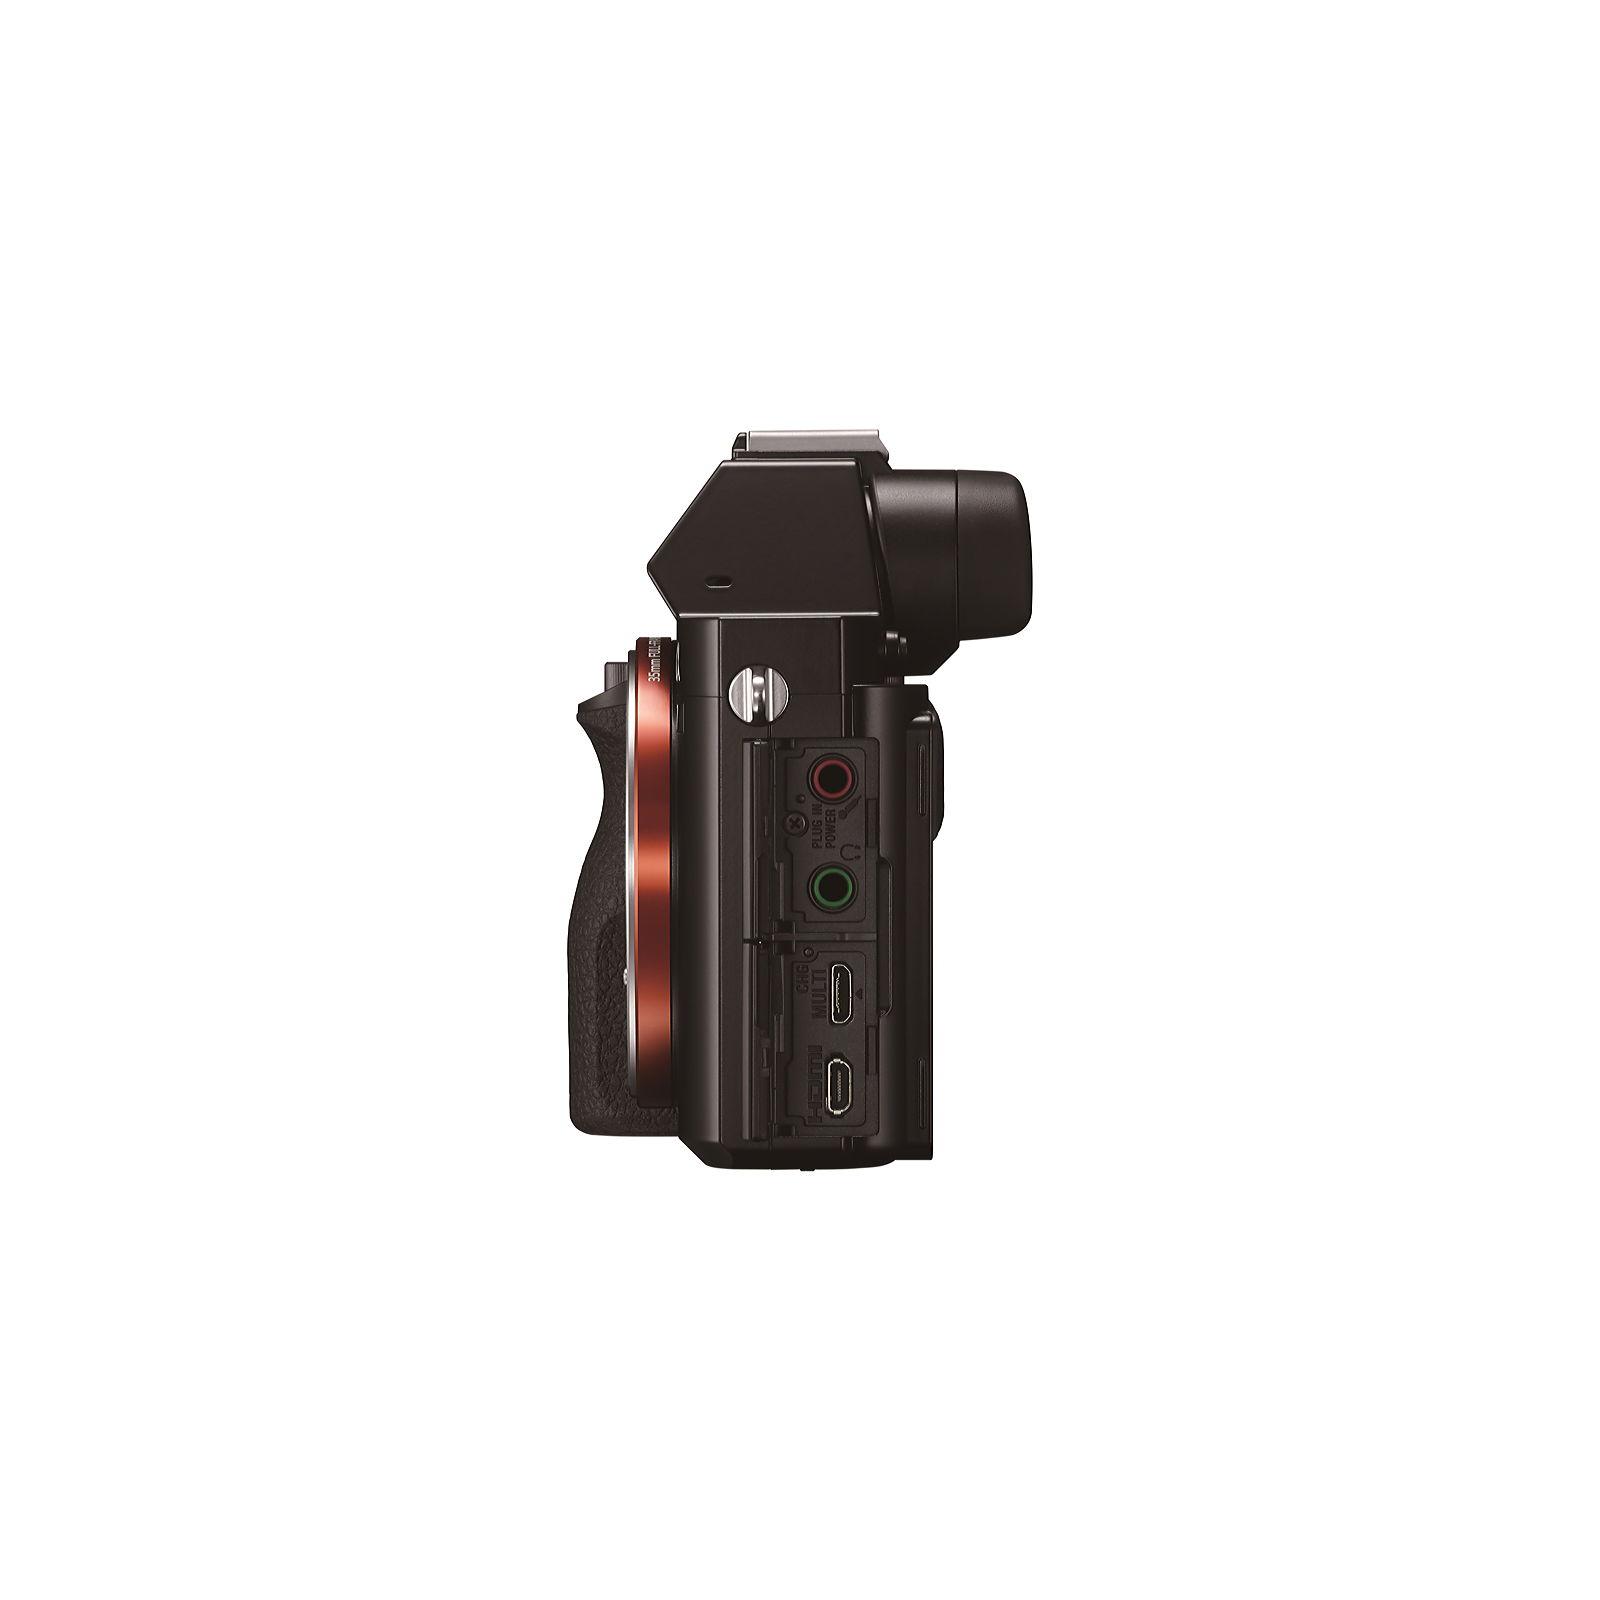 Цифровой фотоаппарат SONY Alpha 7 body black (ILCE7B.RU2) изображение 10